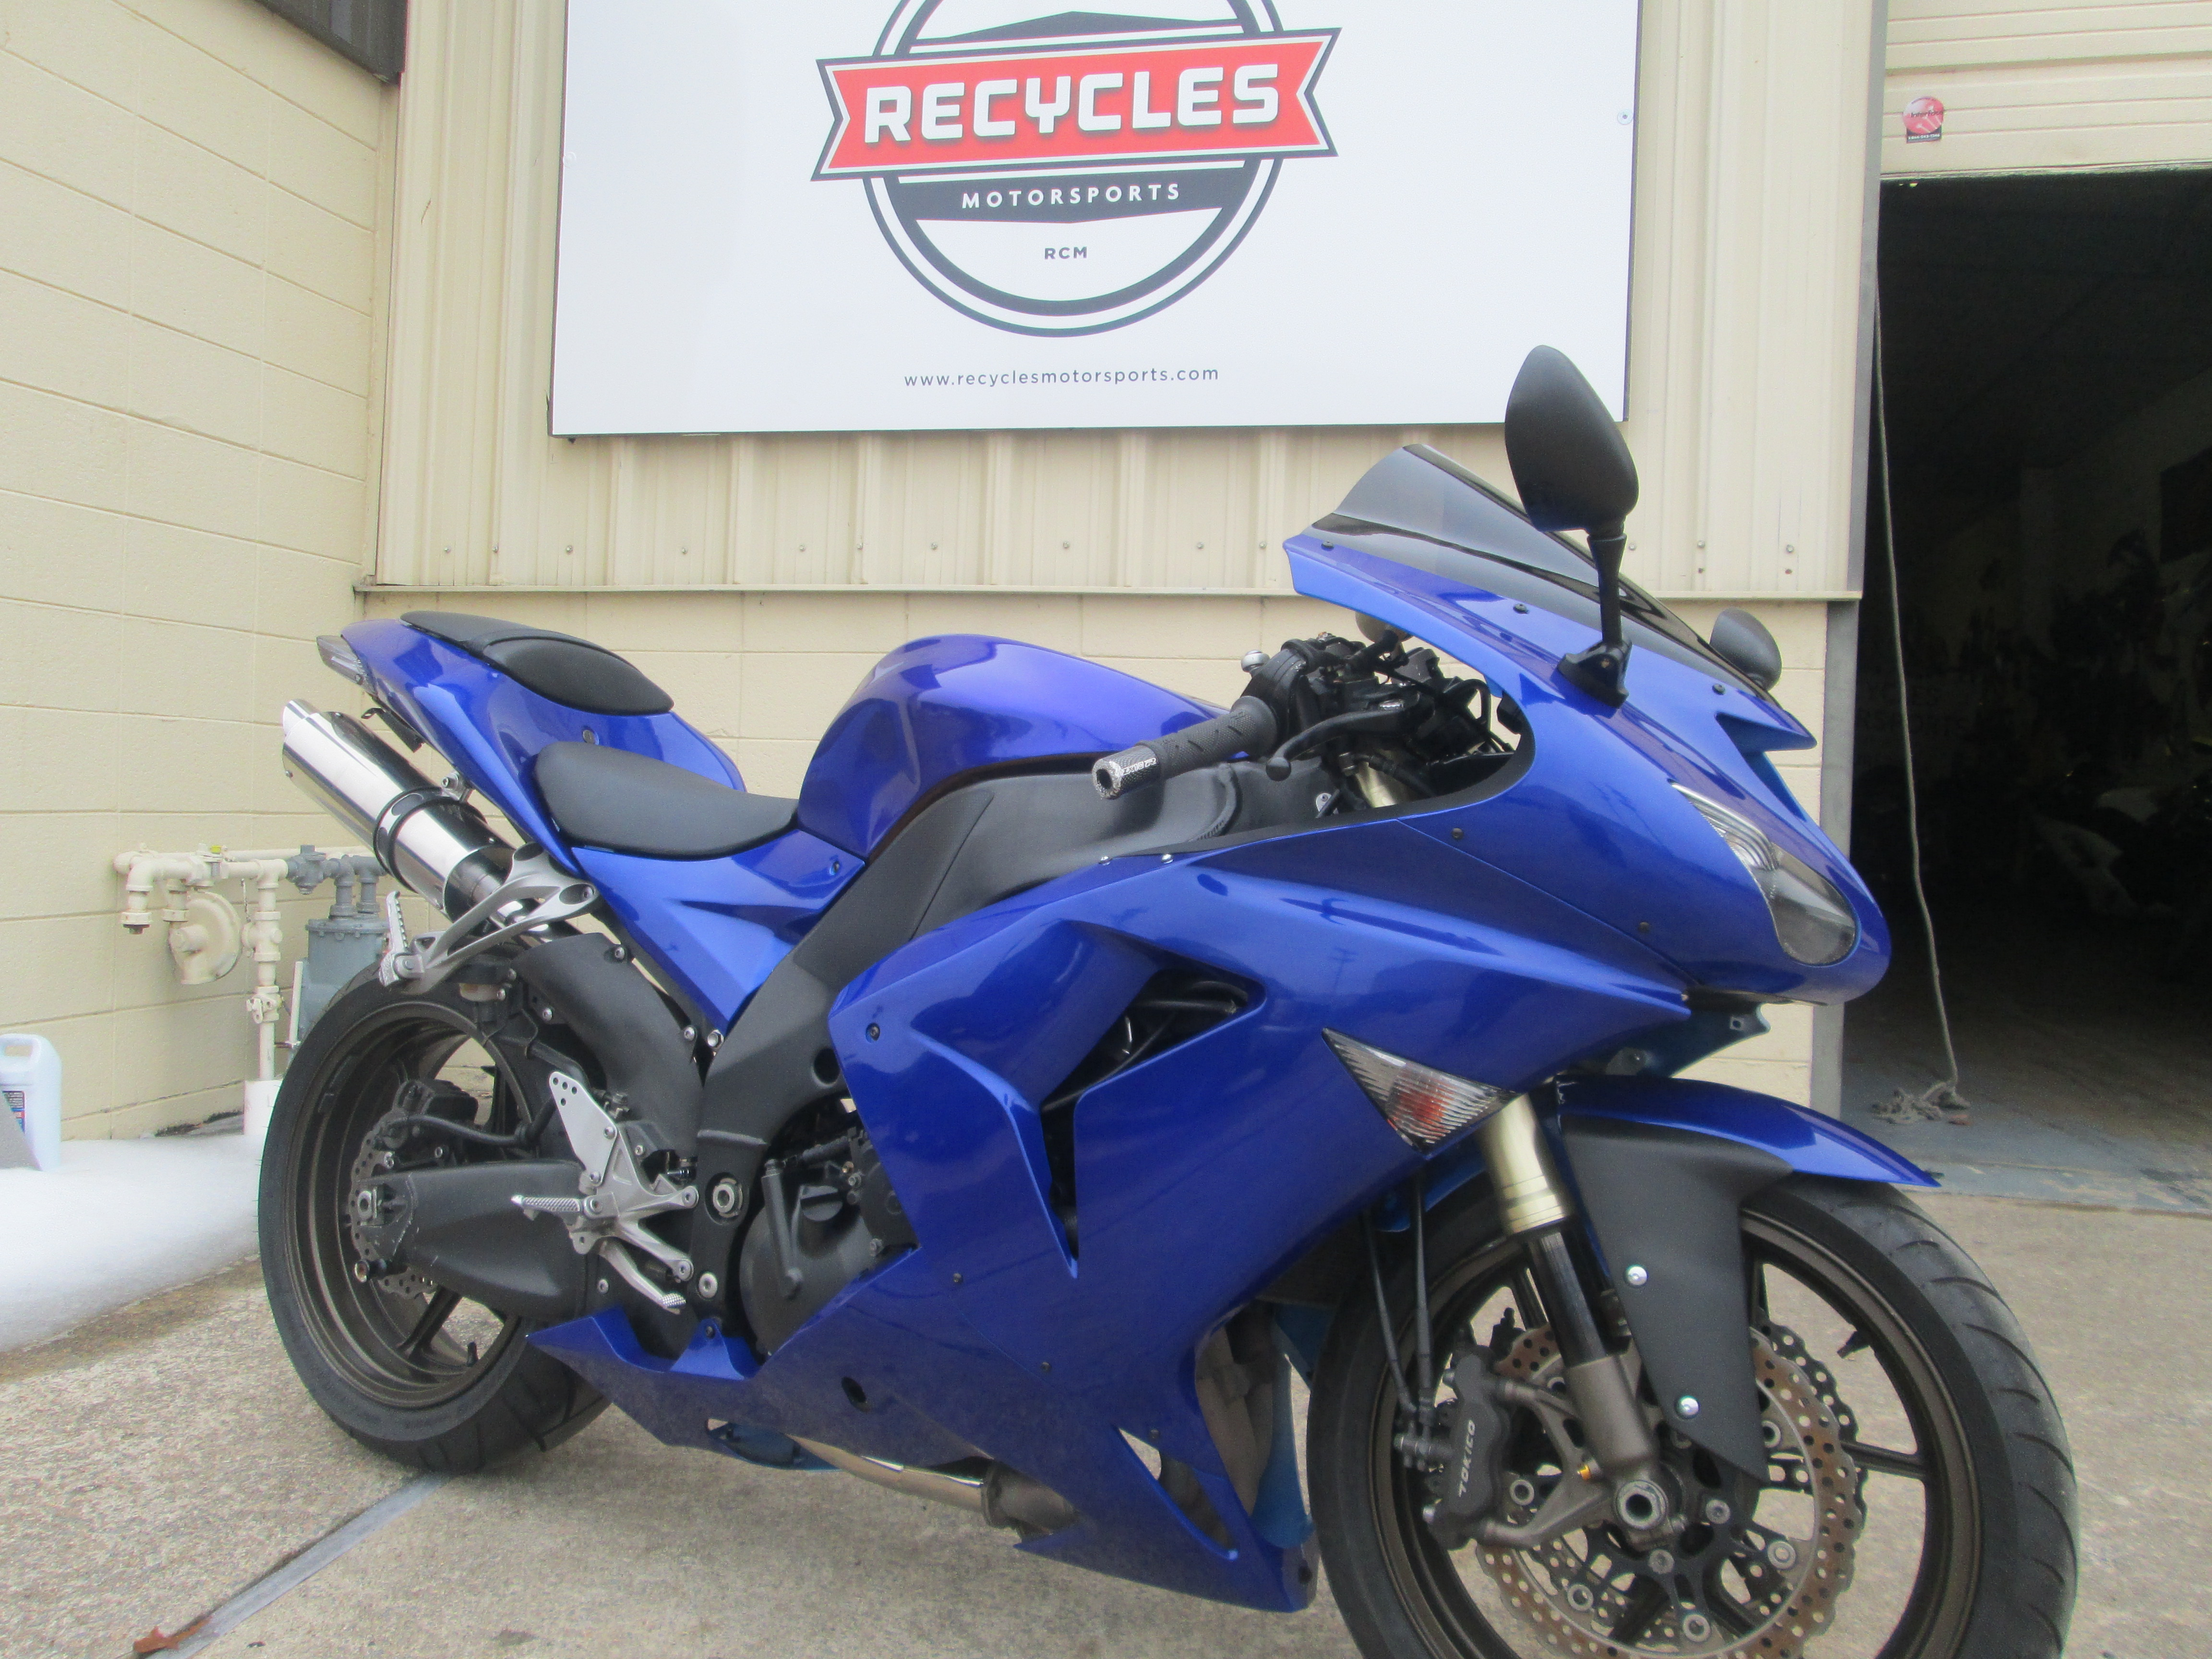 featured recycles motorsports Ninja ZX10 zx10 zx10r custom north little rock arkansas ar motorcycle